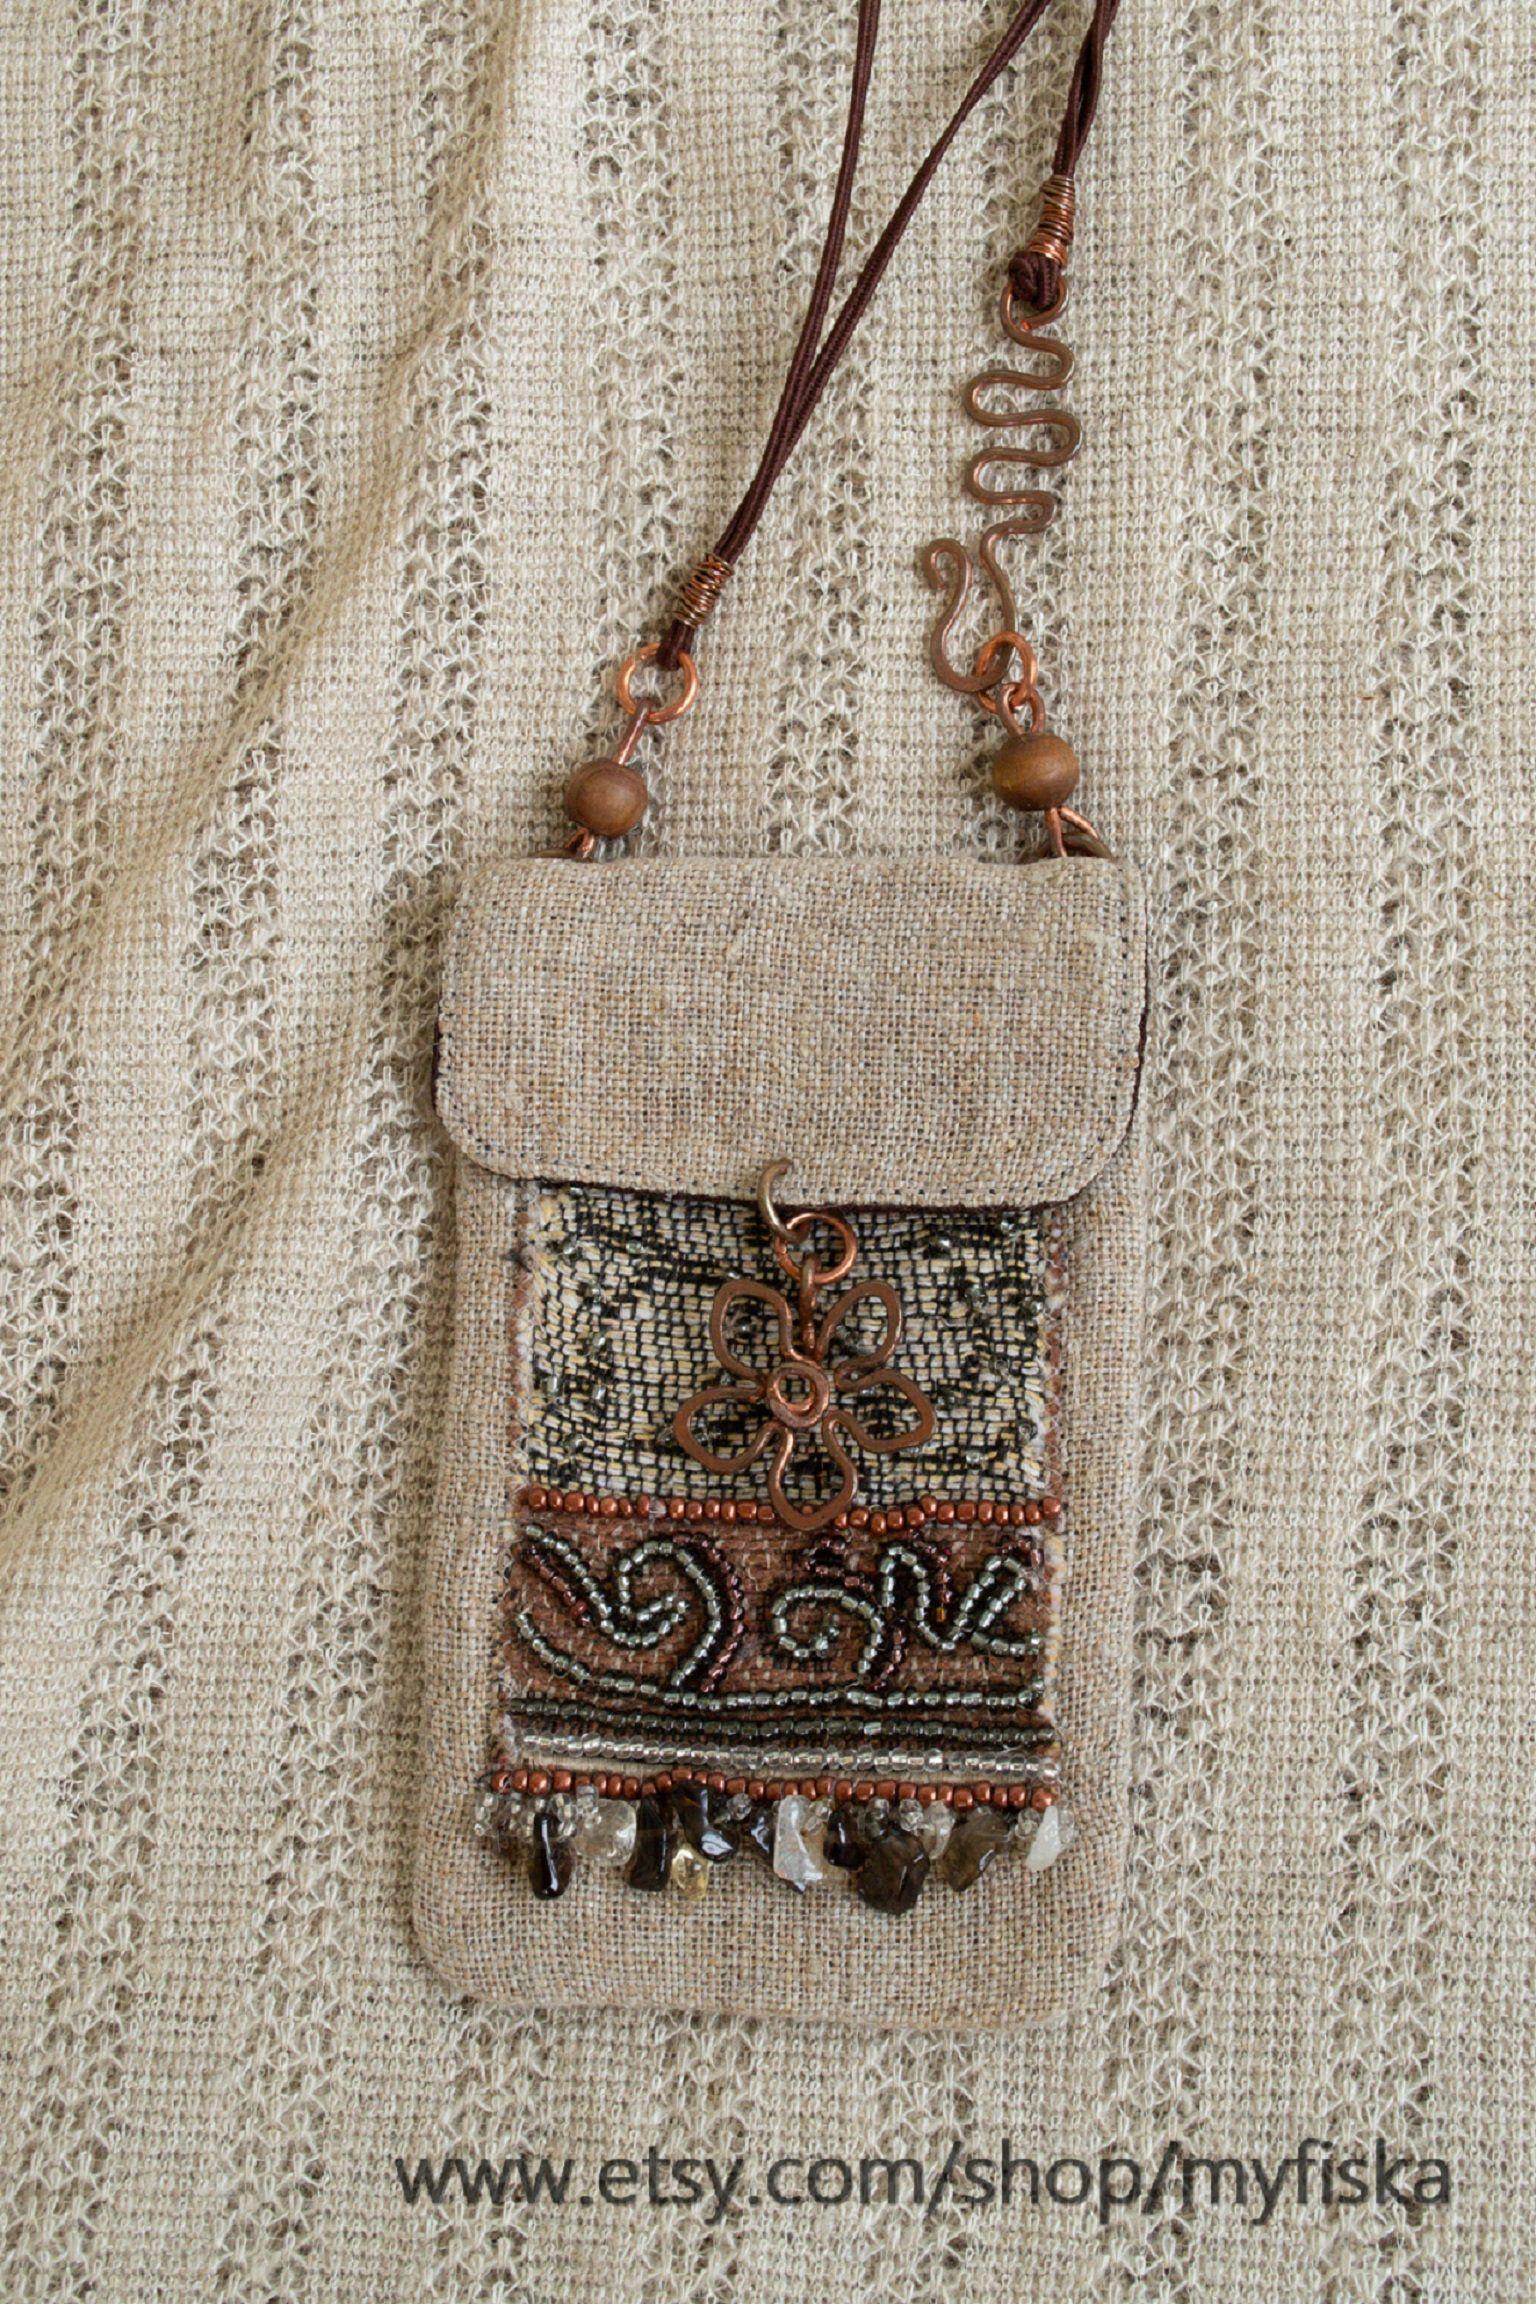 Photo of Linen Amulet bag,Amulet pouch,Textile pendant necklace,Hippie,Boho purse and bag,Bead Medicine bag necklace,Boho neck bag,One of a kind bag